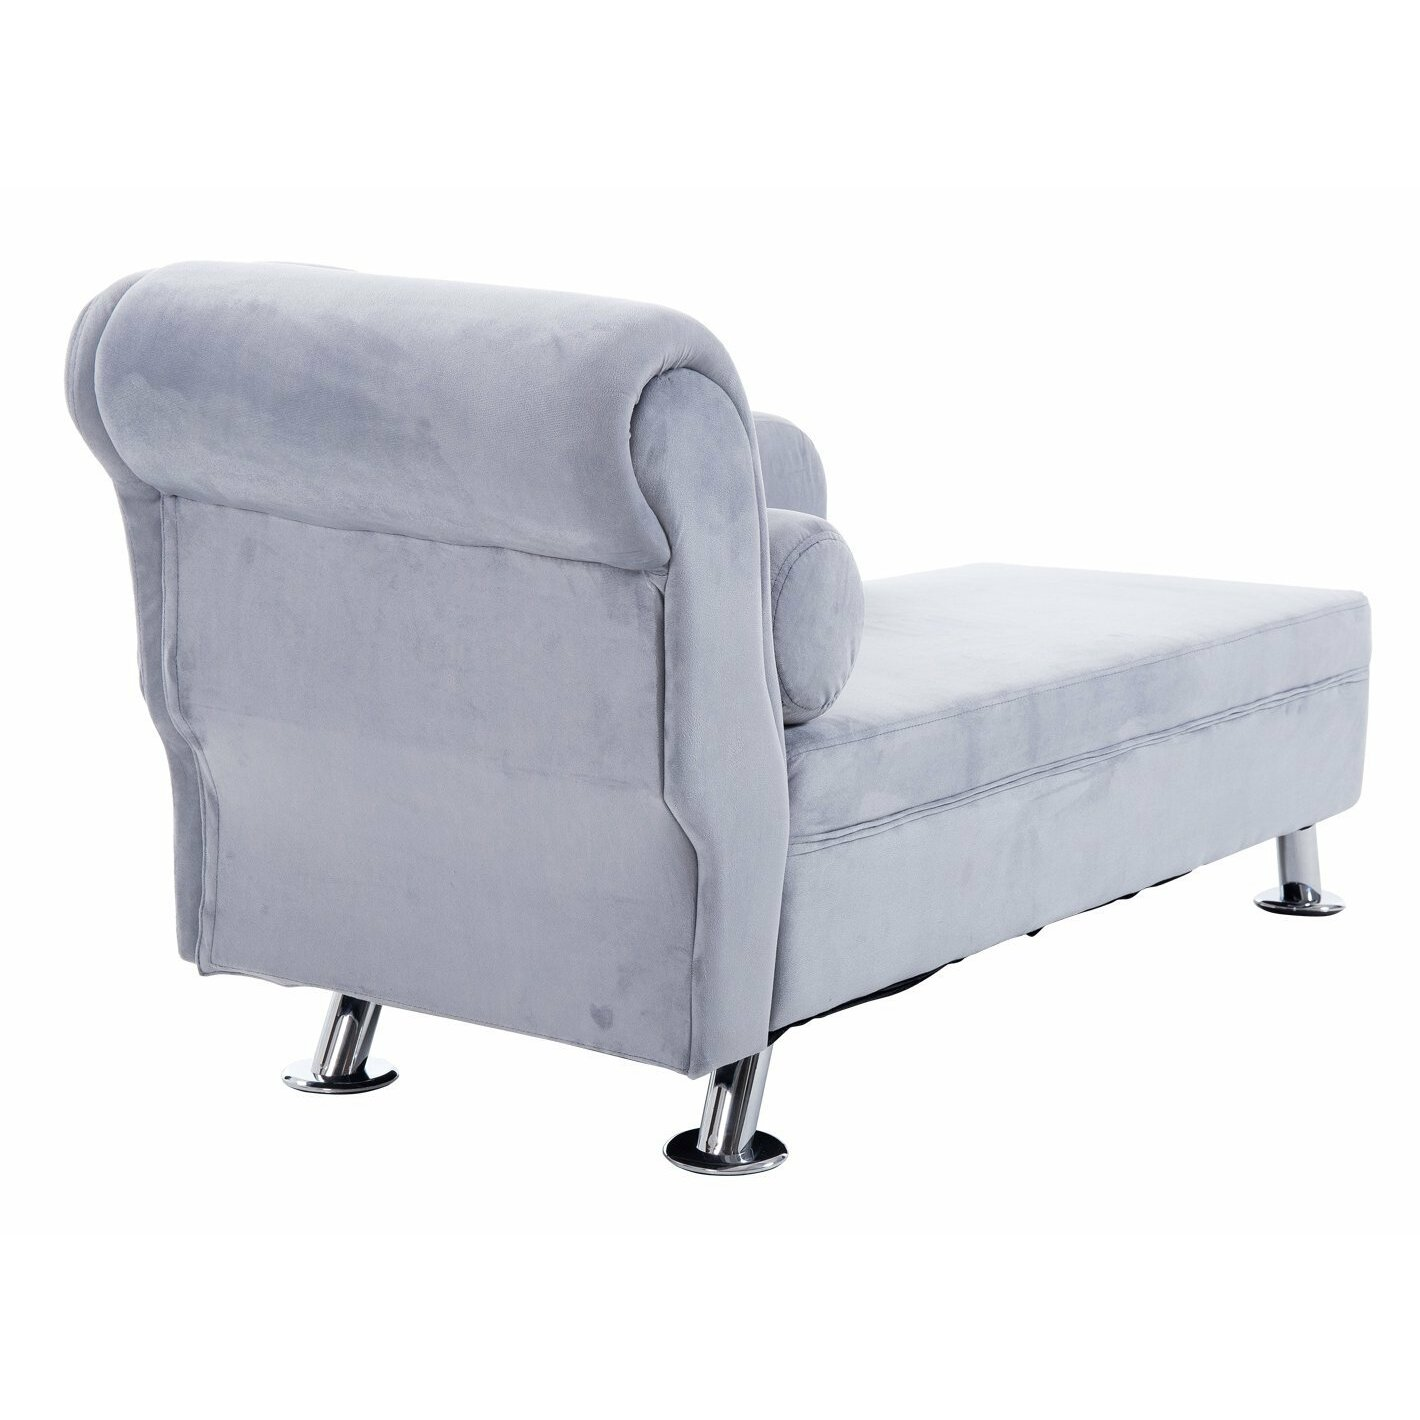 Homcom deluxe chaise longue reviews wayfair uk for Chaise longue 2 personnes